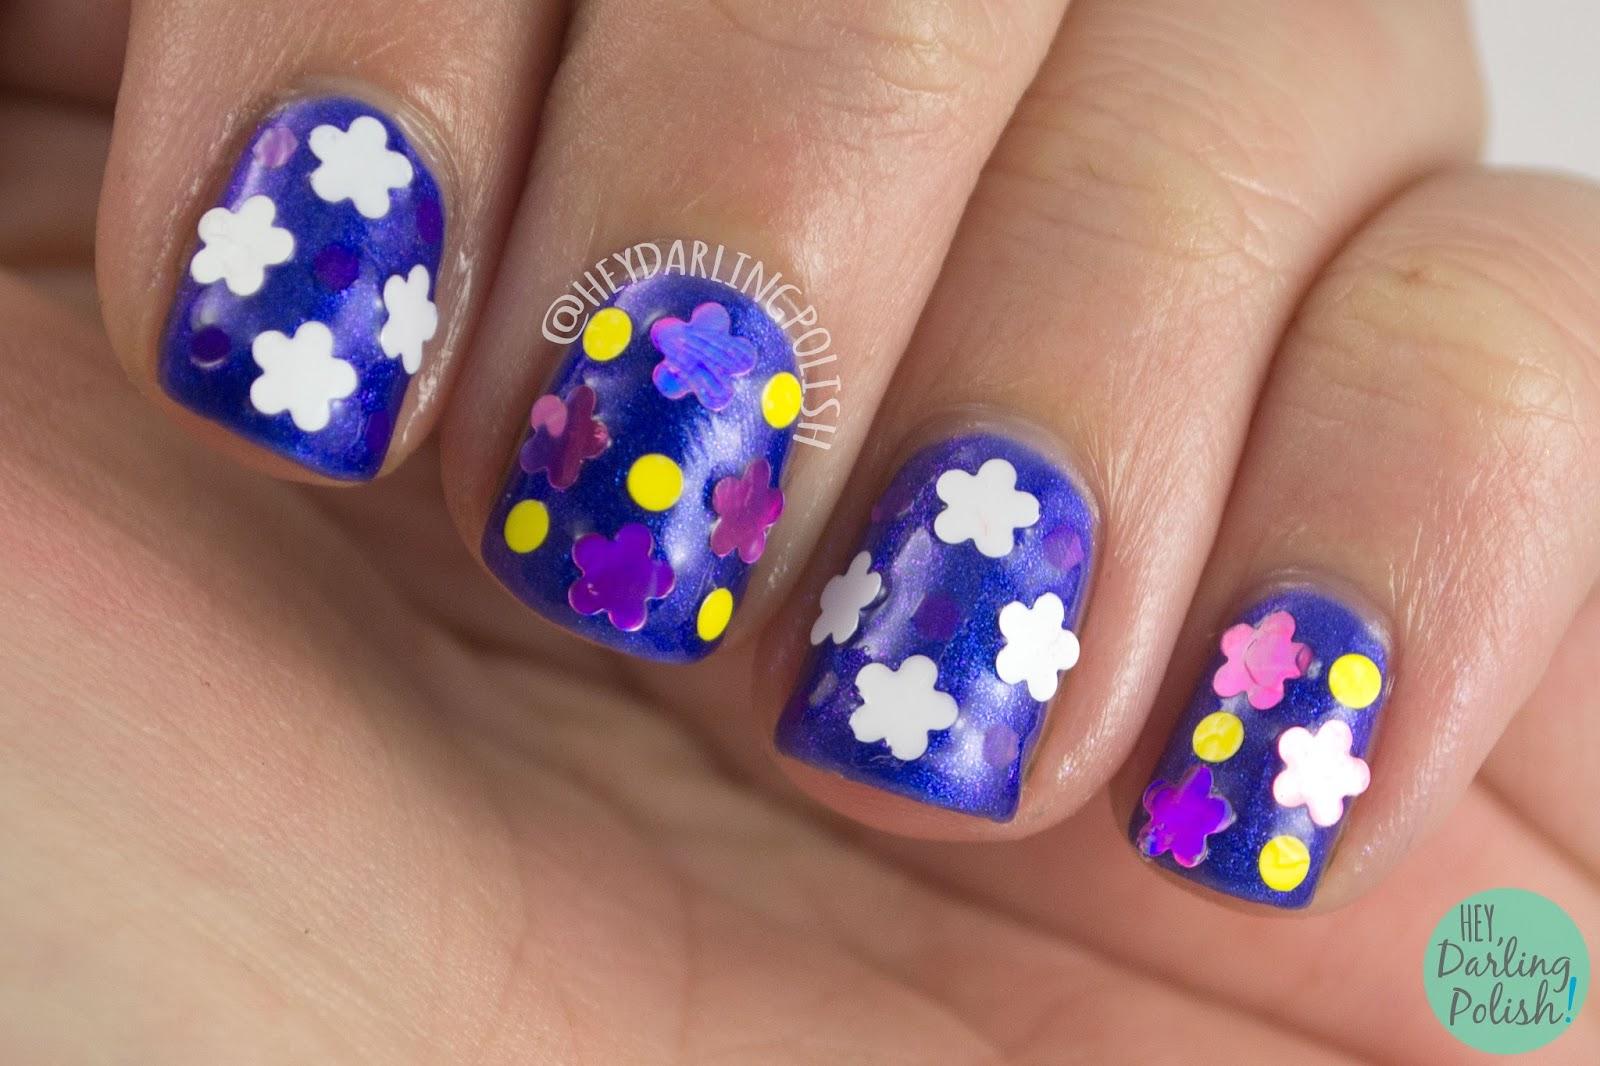 nails, nail polish, indie polish, indie, kitty polish, hey darling polish, blue, purple, amaze balls, nail art, flowers, glitter